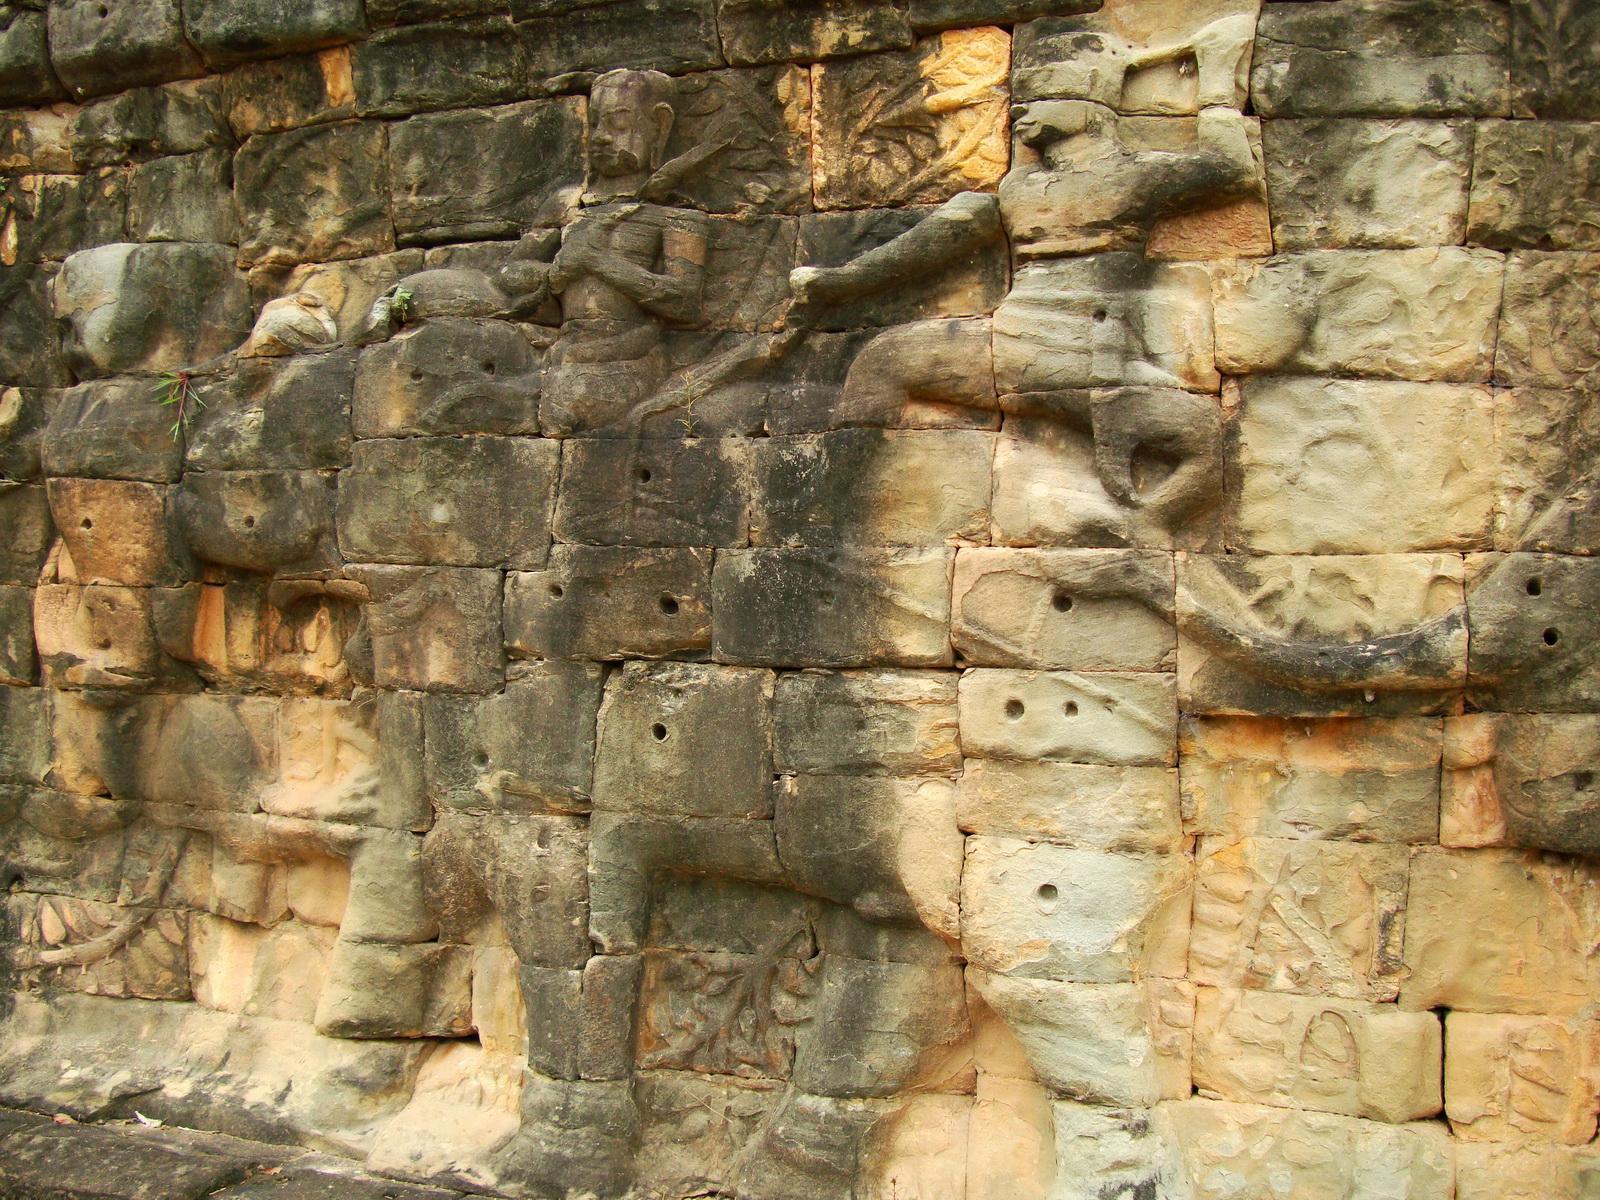 Terrace of the Elephants Bas reliefs hunting scenes 11